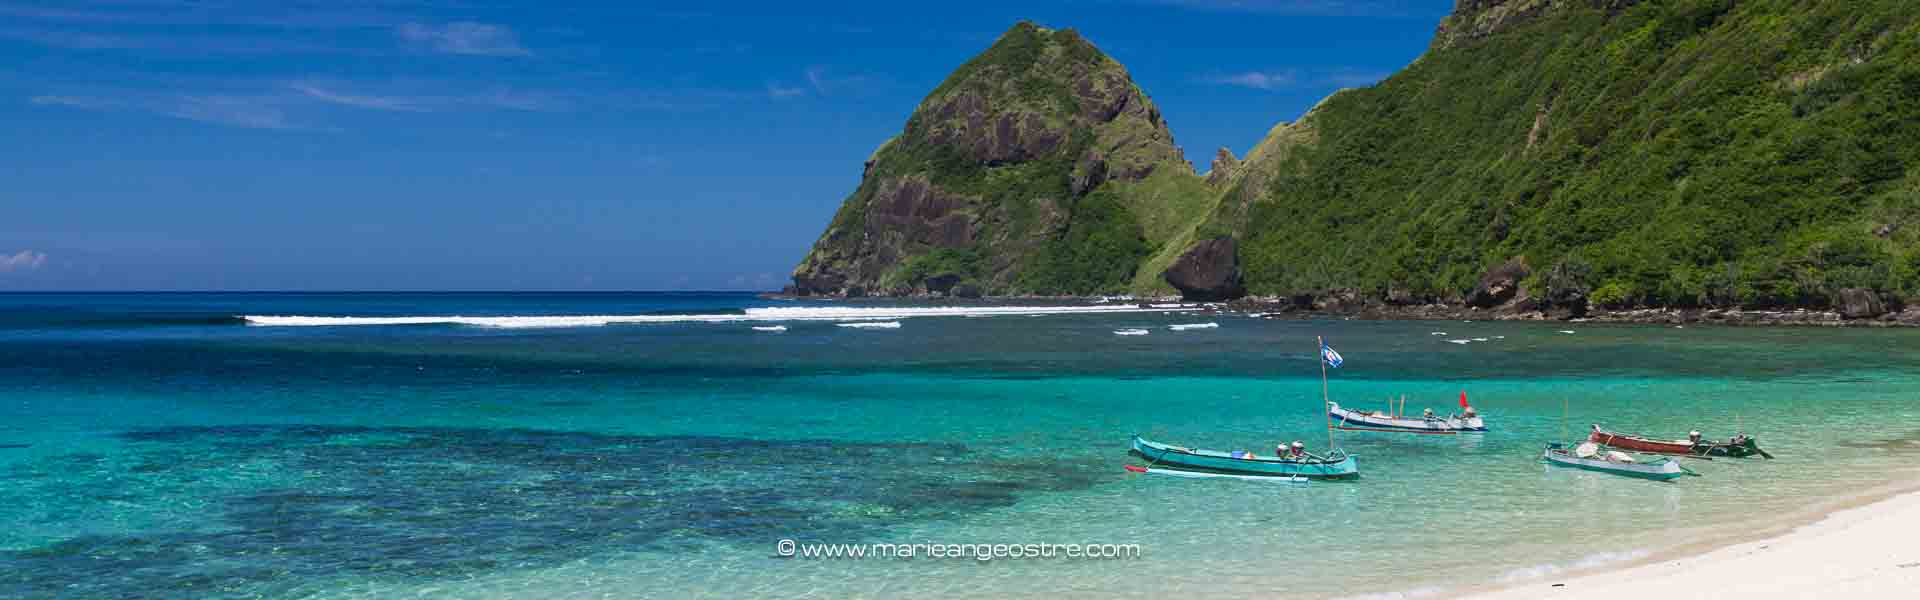 Indonésie, île de Sumbawa ©Marie-Ange Ostré